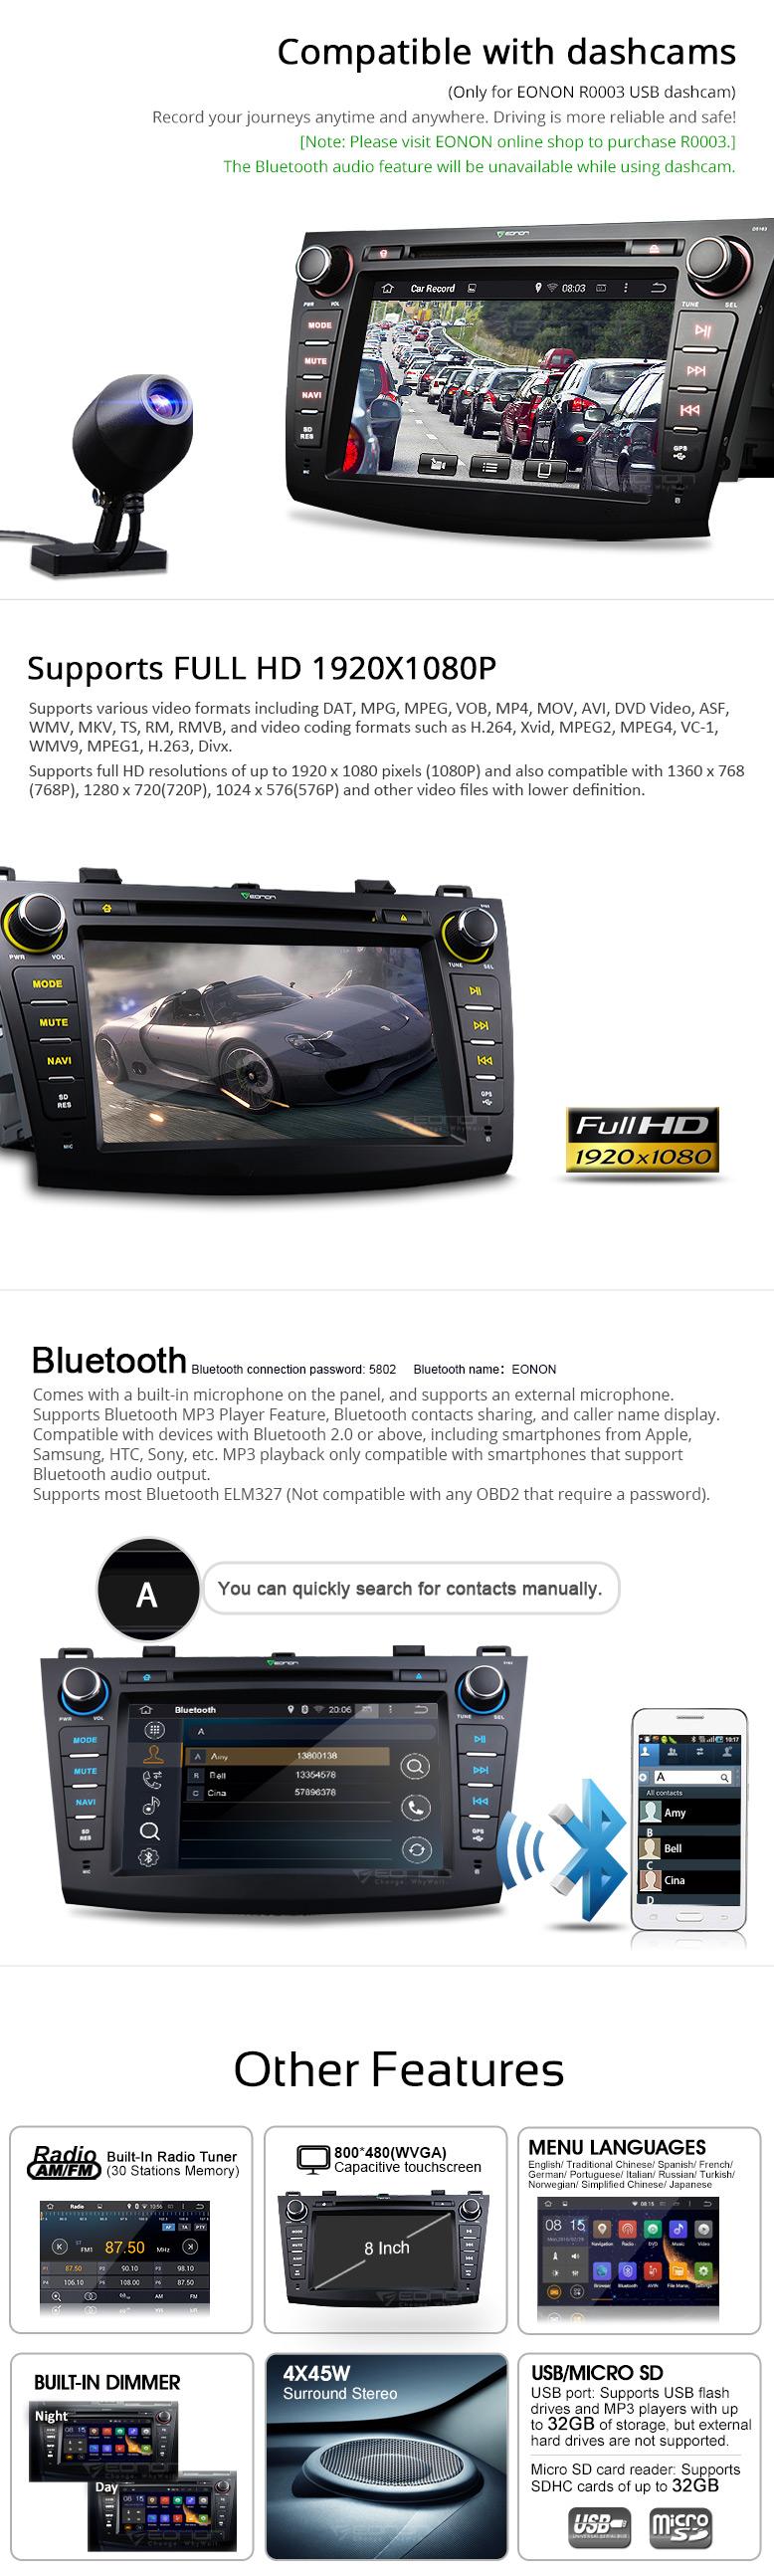 Eonon Ga5163f Mazda 3 Navigation Android Car Dvd Double Din Wire Diagram Navigationandroid Playerandroid Gps